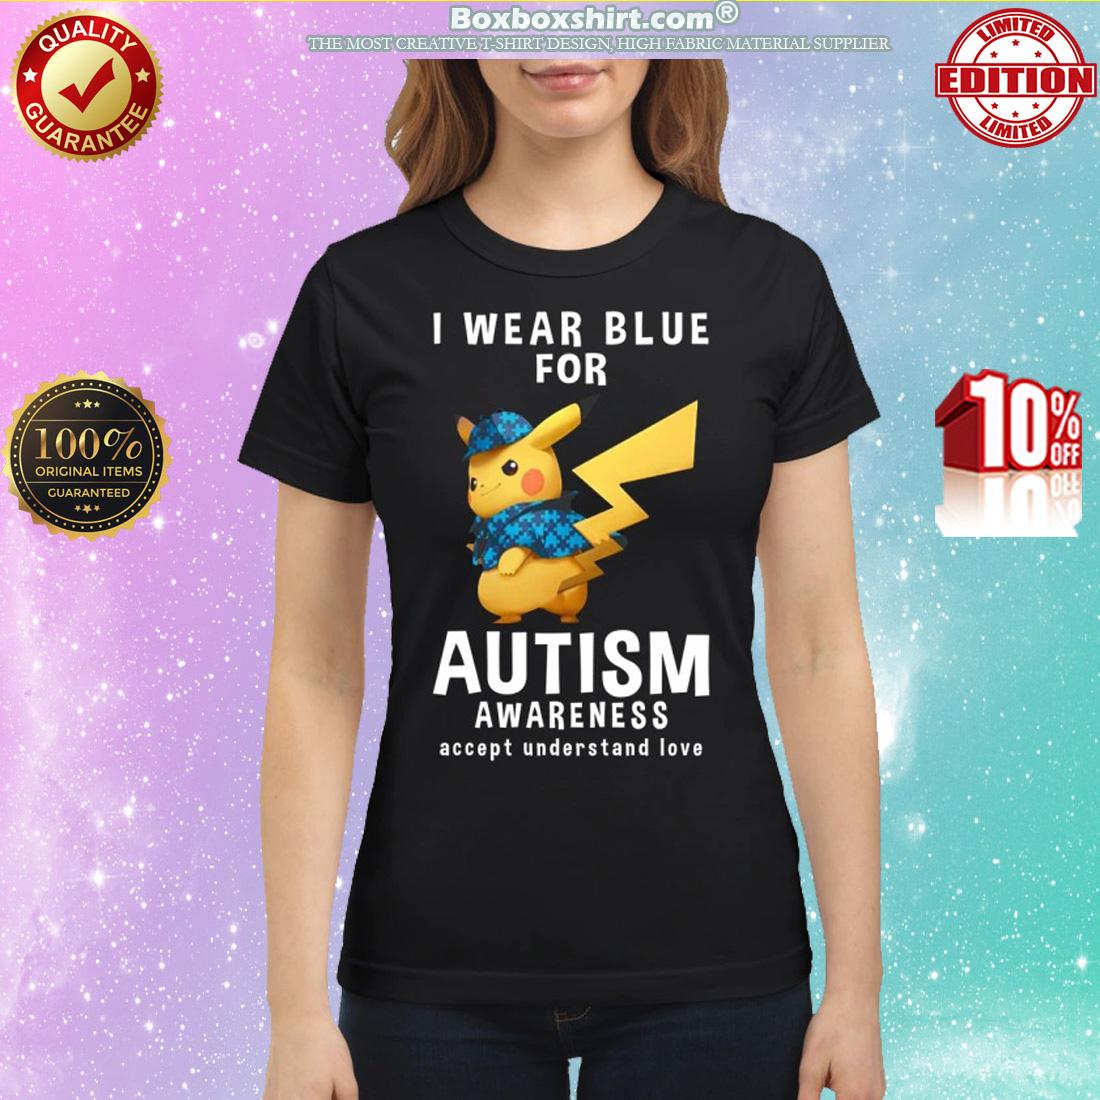 Pikachu I wear blue for autism awareness accept understand love classic shirt